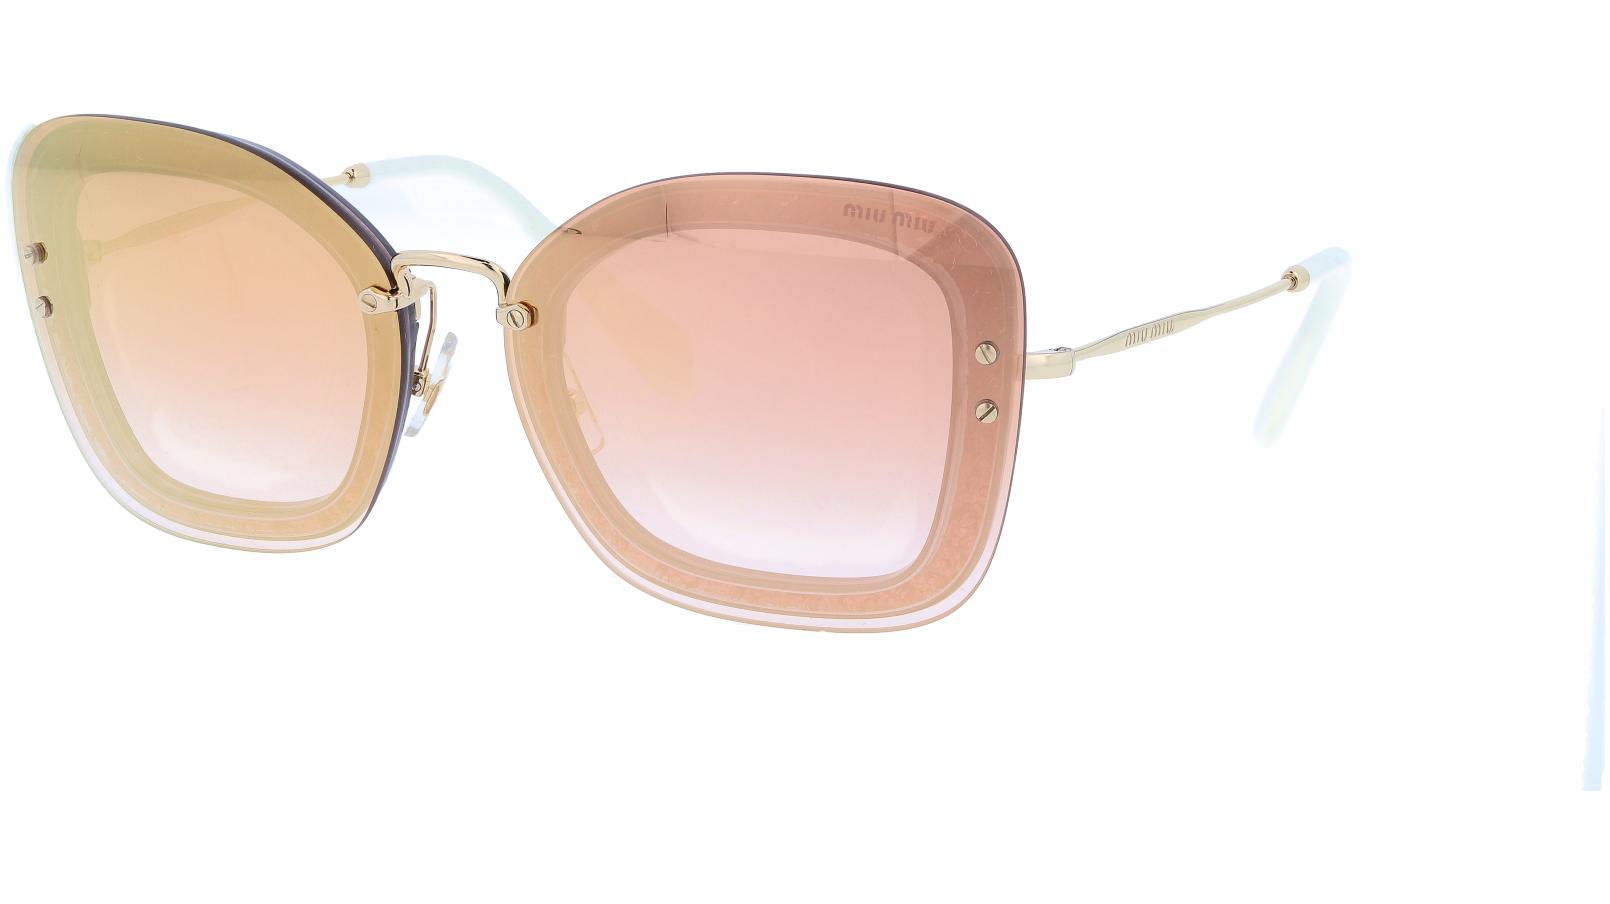 Miu Miu MU02TS 109AD2 65 Pink Cat-Eye Sunglasses